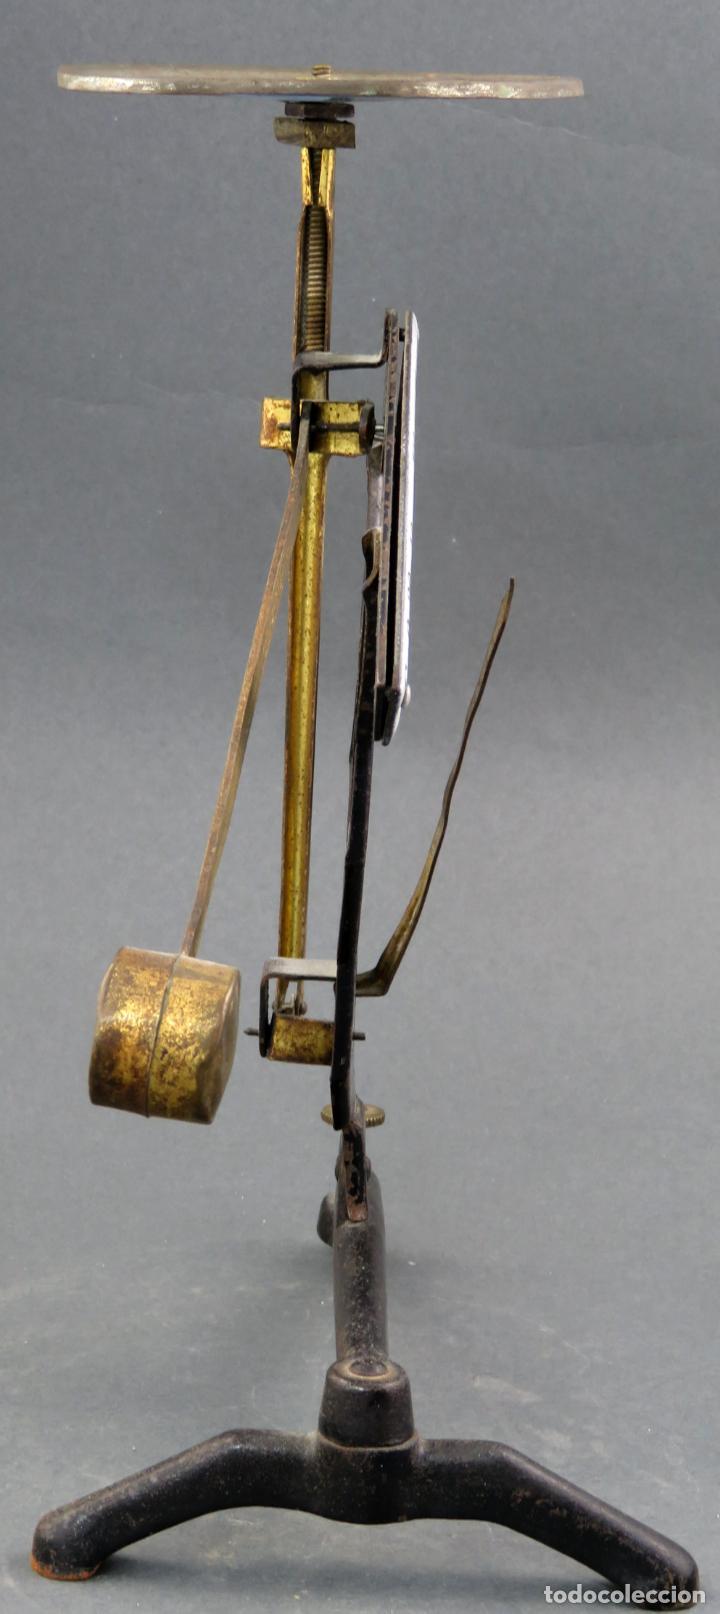 Antigüedades: Bascula balanza española postal pesar cartas correo en hierro Jmaz principios siglo XX - Foto 5 - 142681646